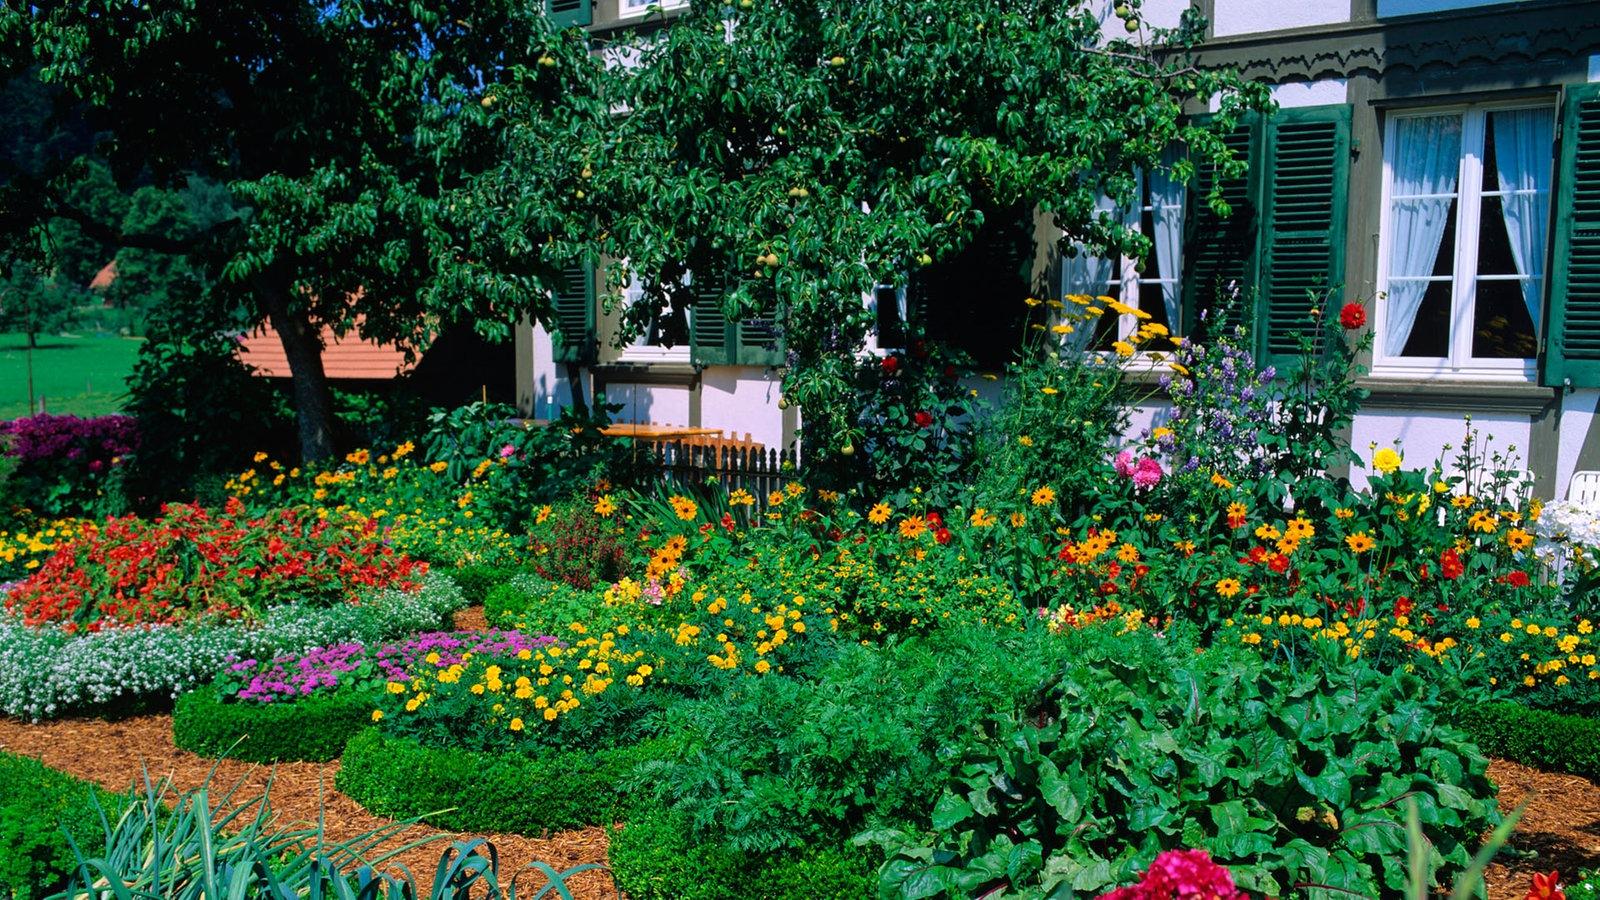 pflanzen gartenkultur pflanzen natur planet wissen. Black Bedroom Furniture Sets. Home Design Ideas